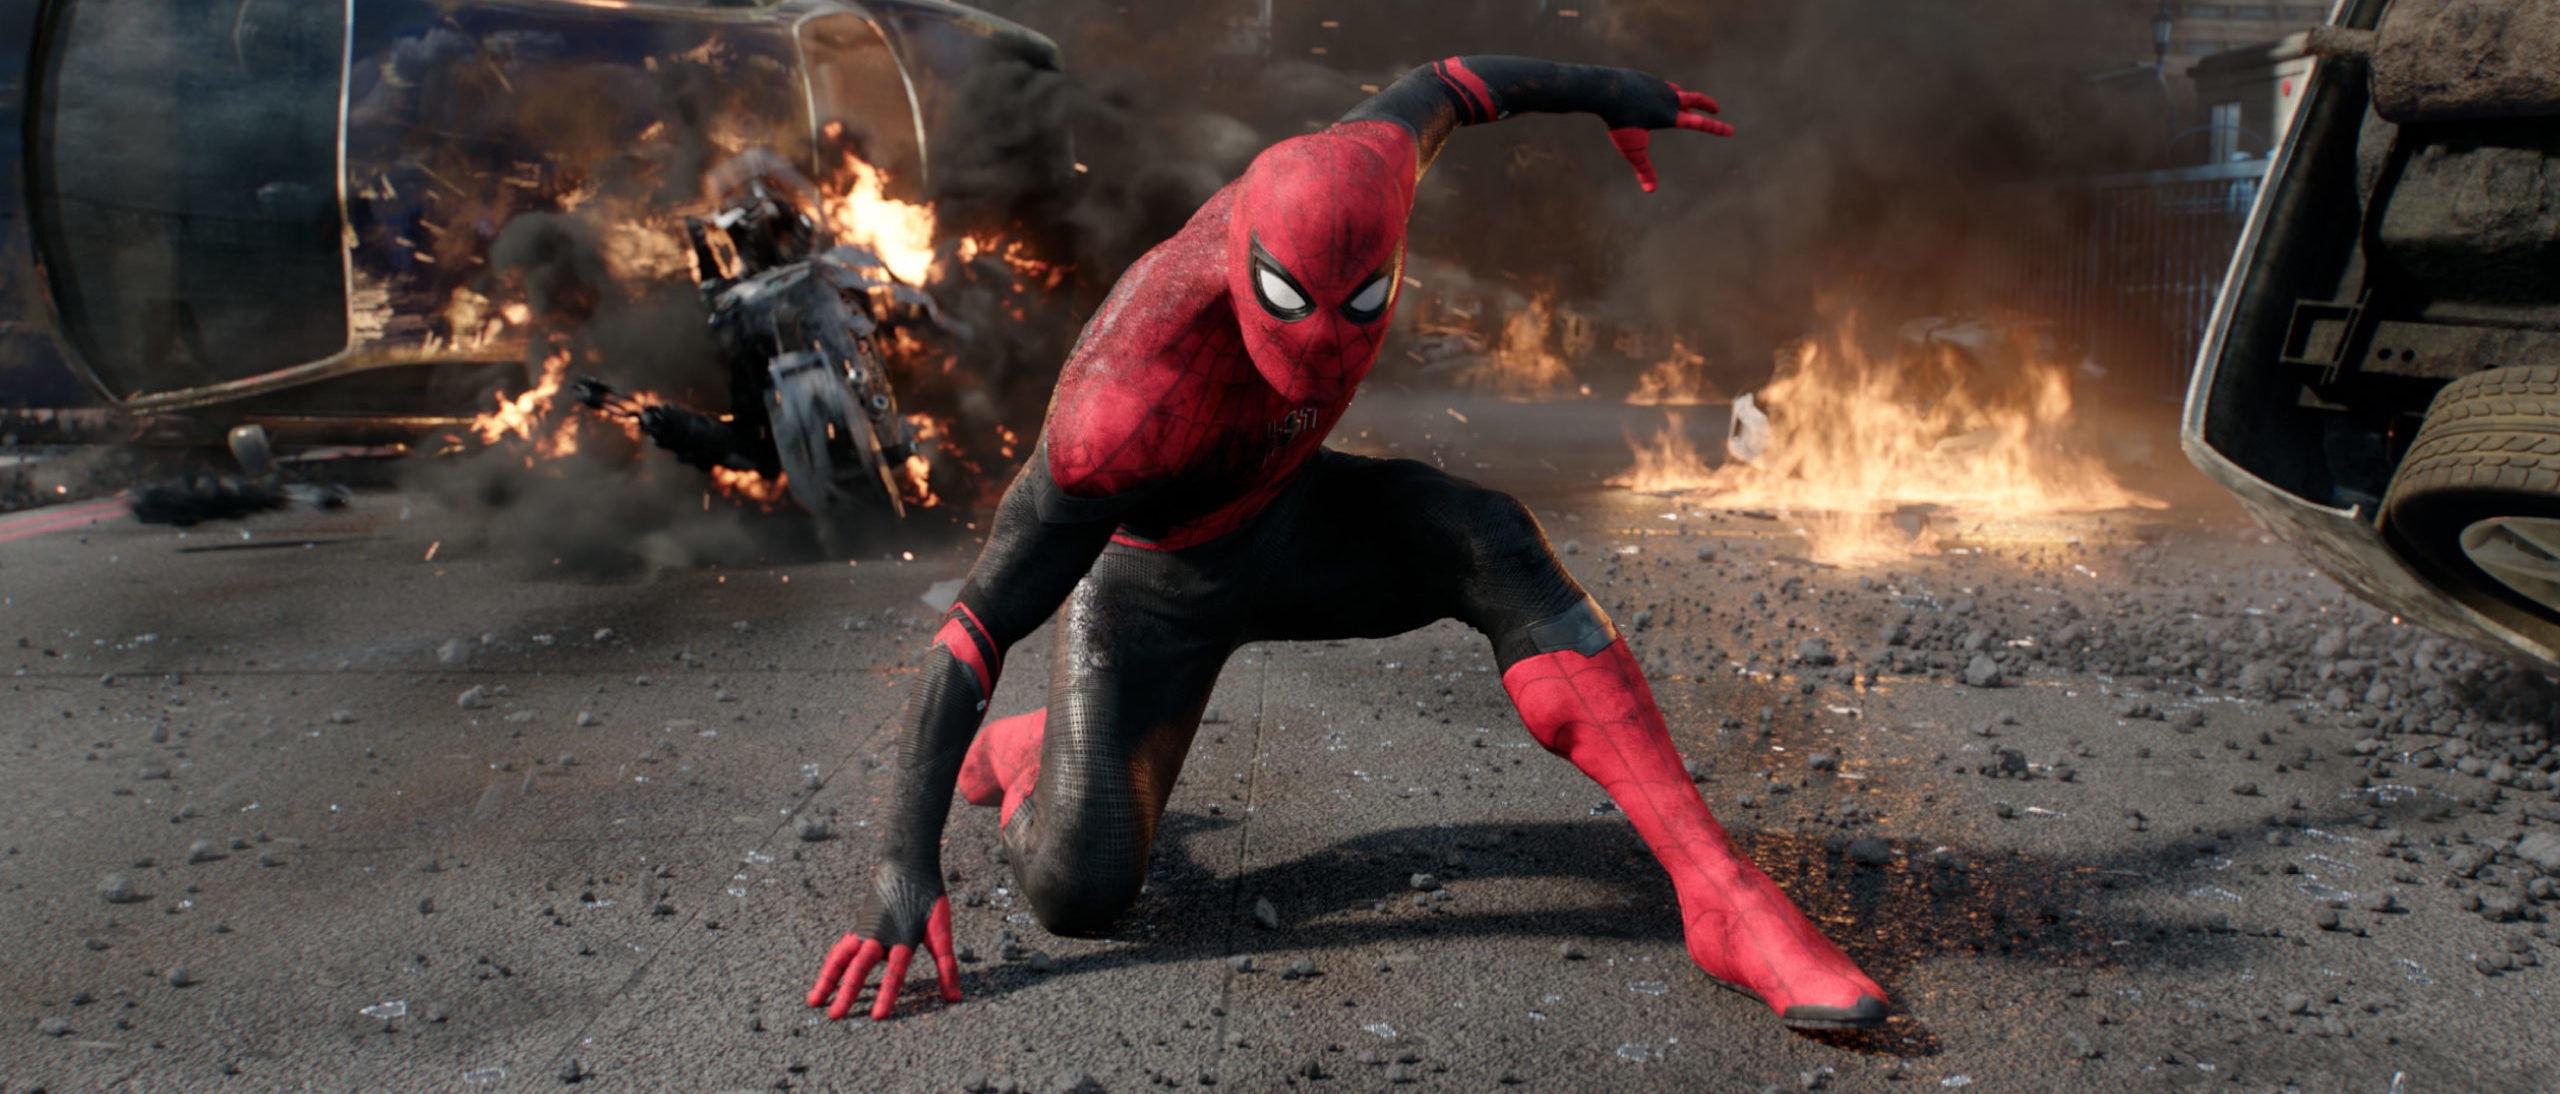 spider-man-far-from-home marvel studios mcu